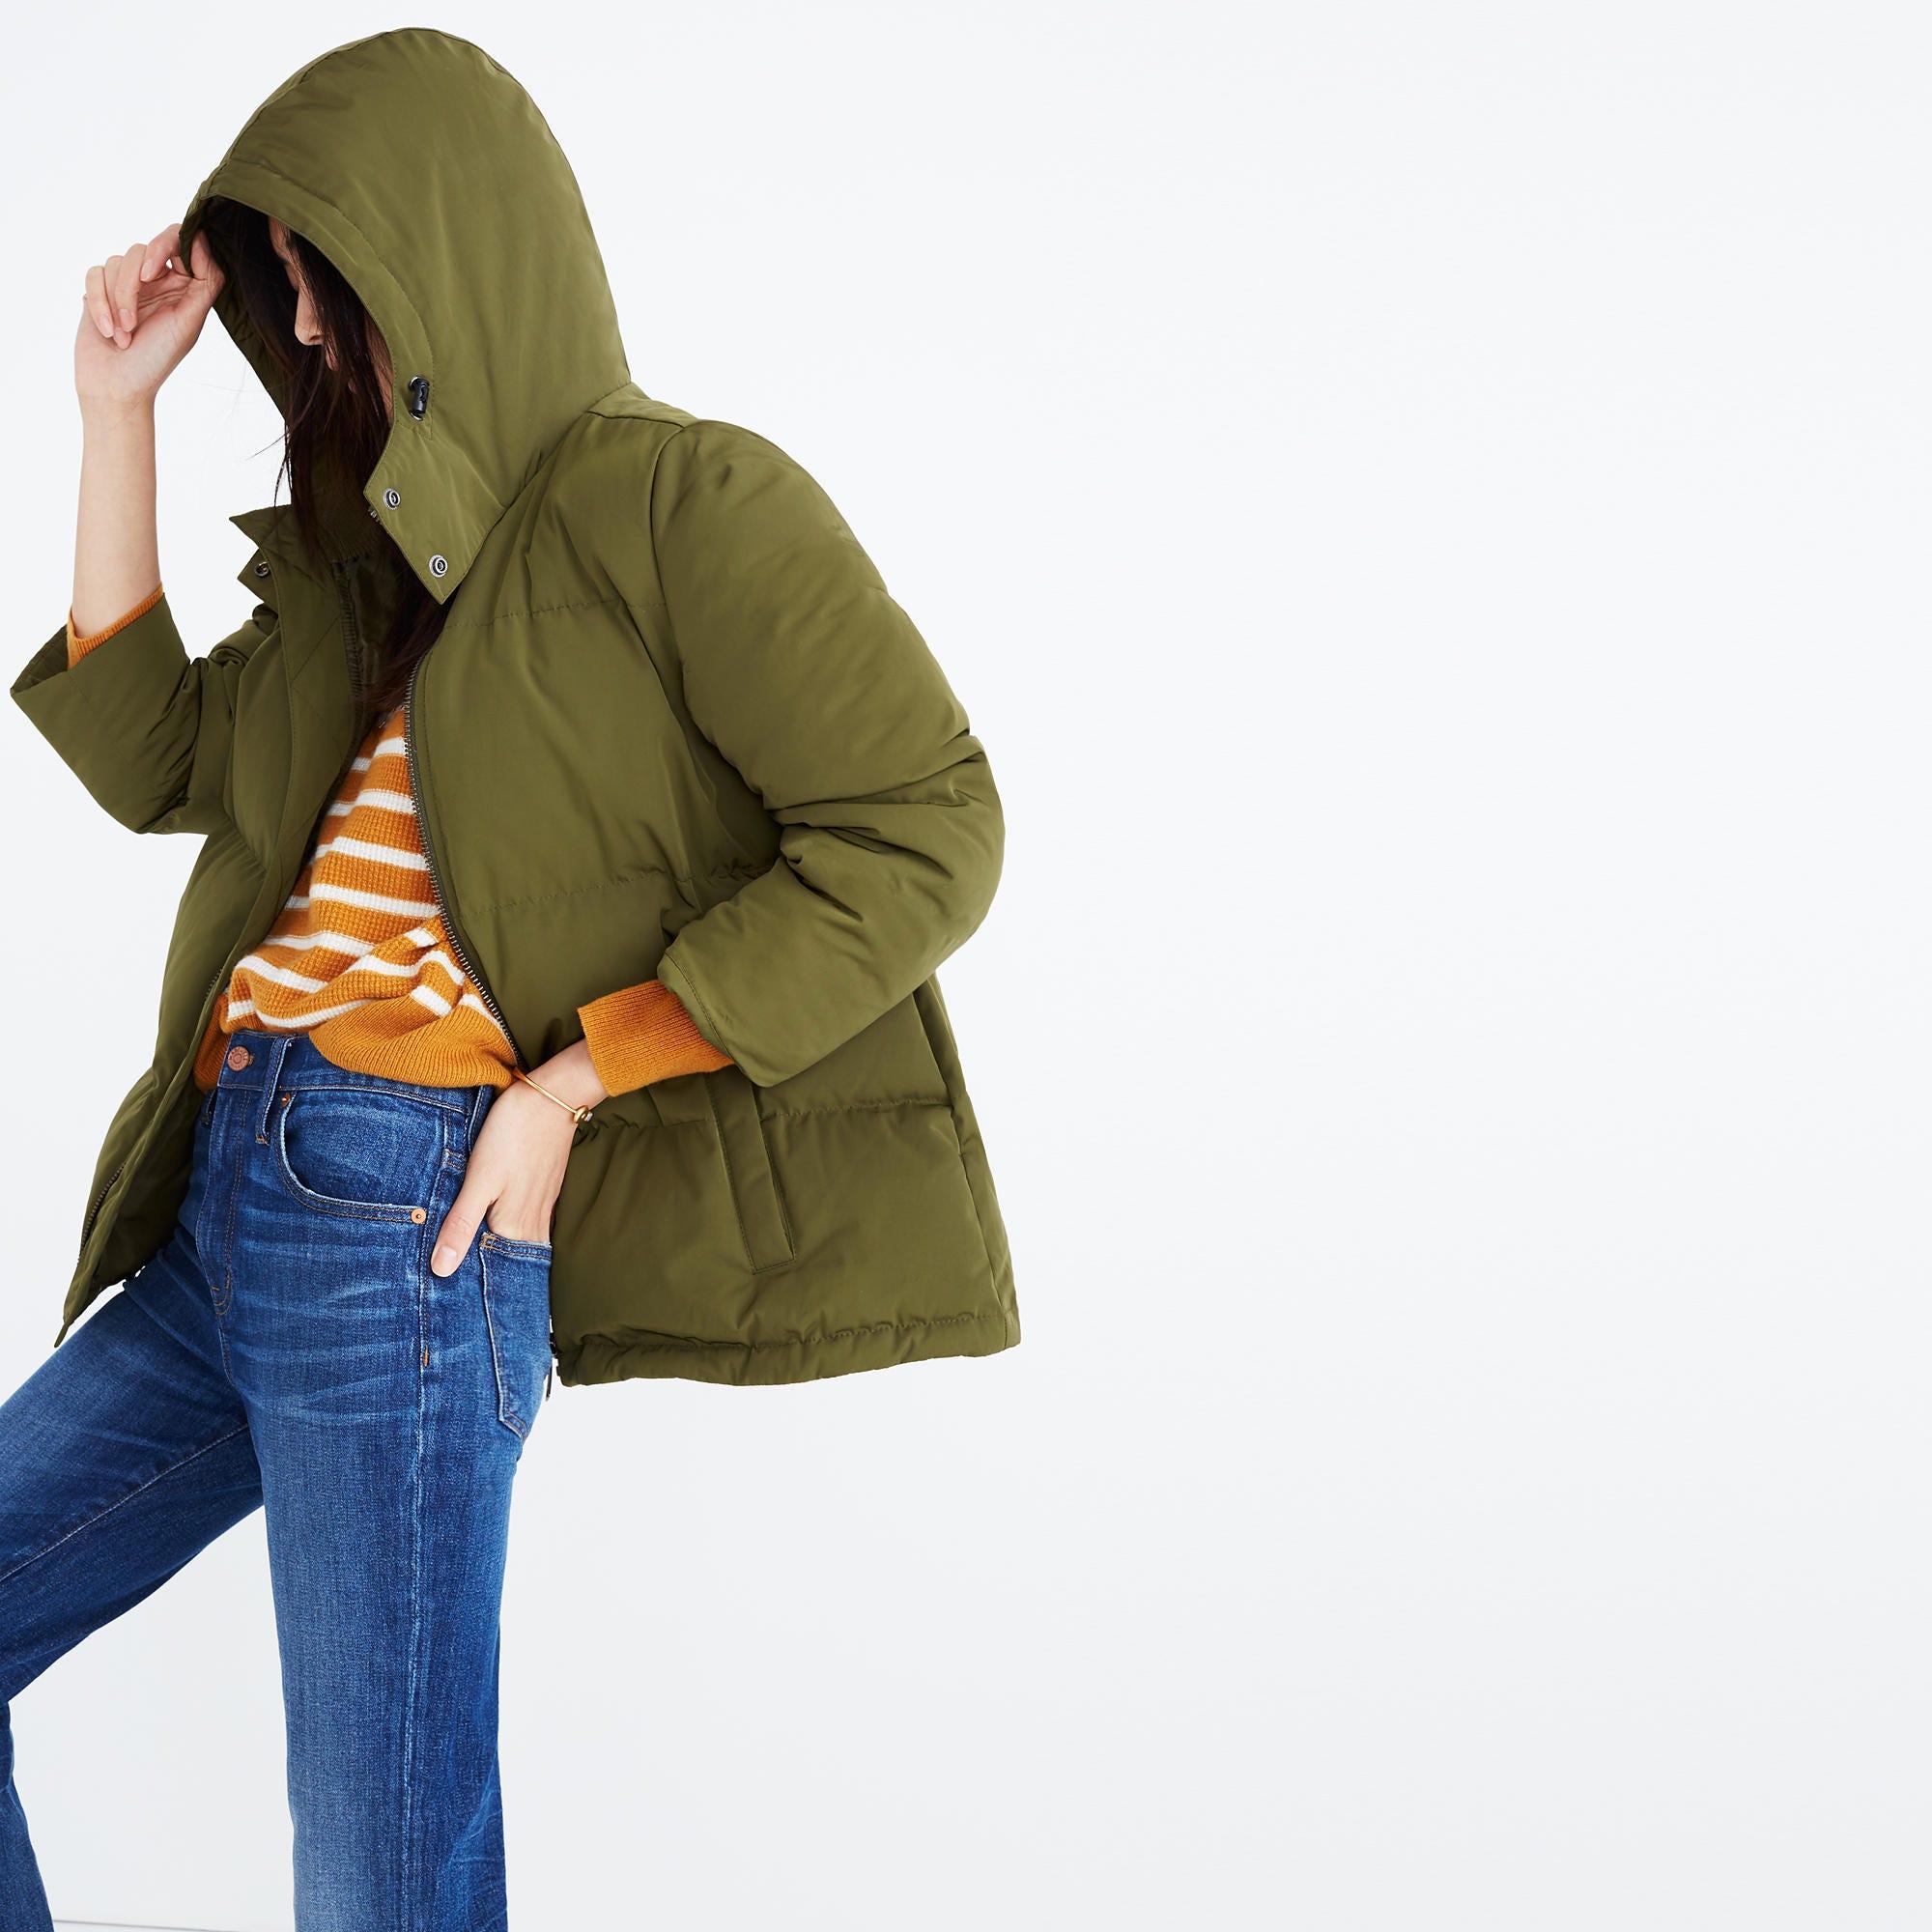 de8adae095992b Best Down Puffer Jackets For Women